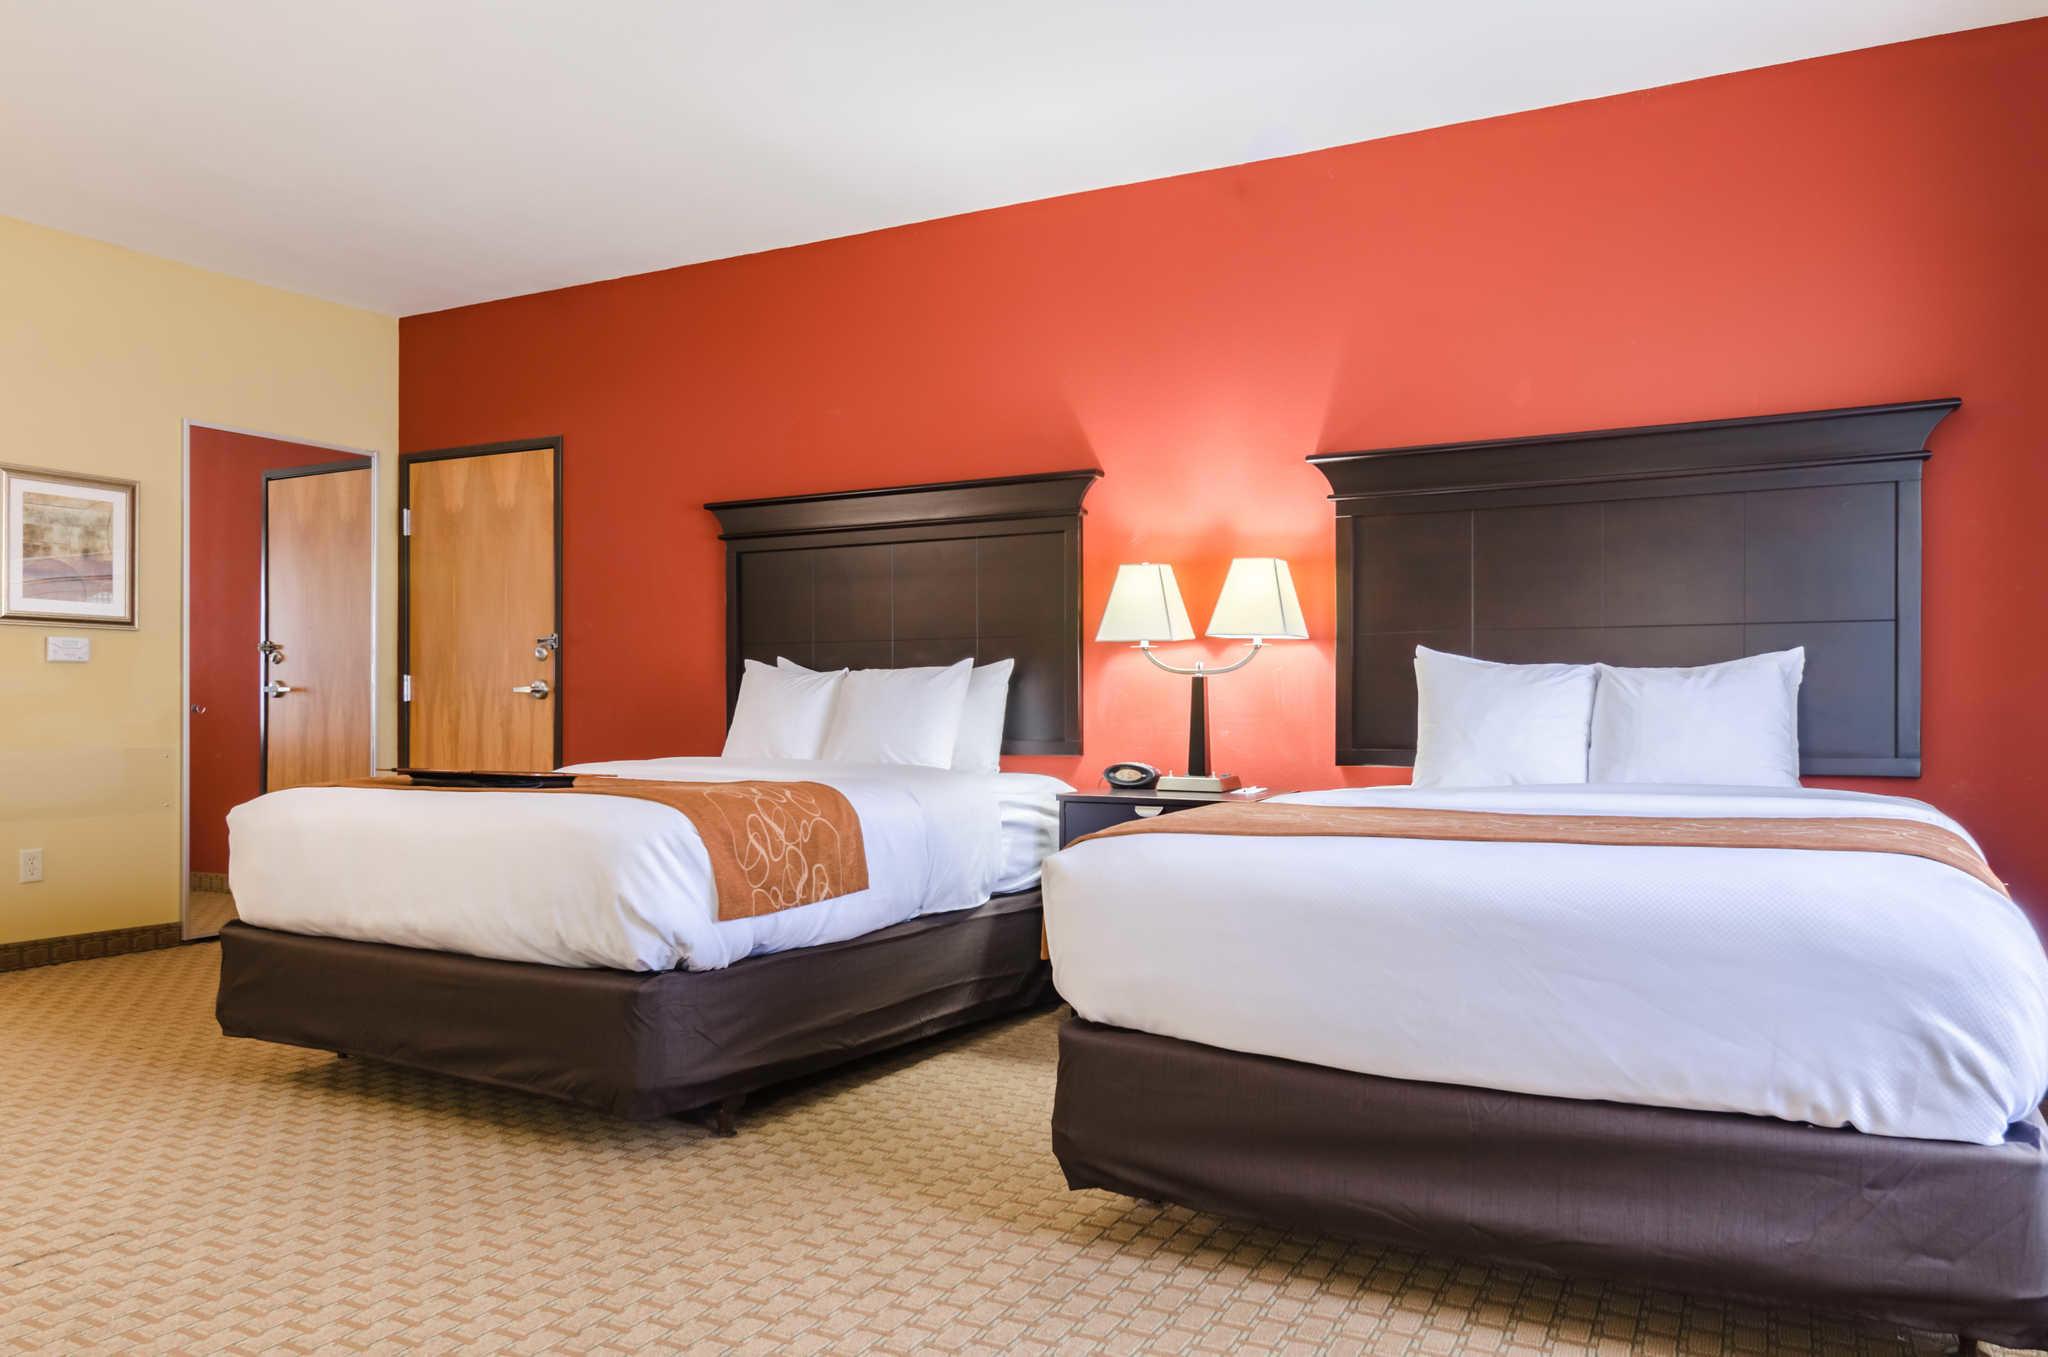 Comfort Suites Salina Ks Business Directory